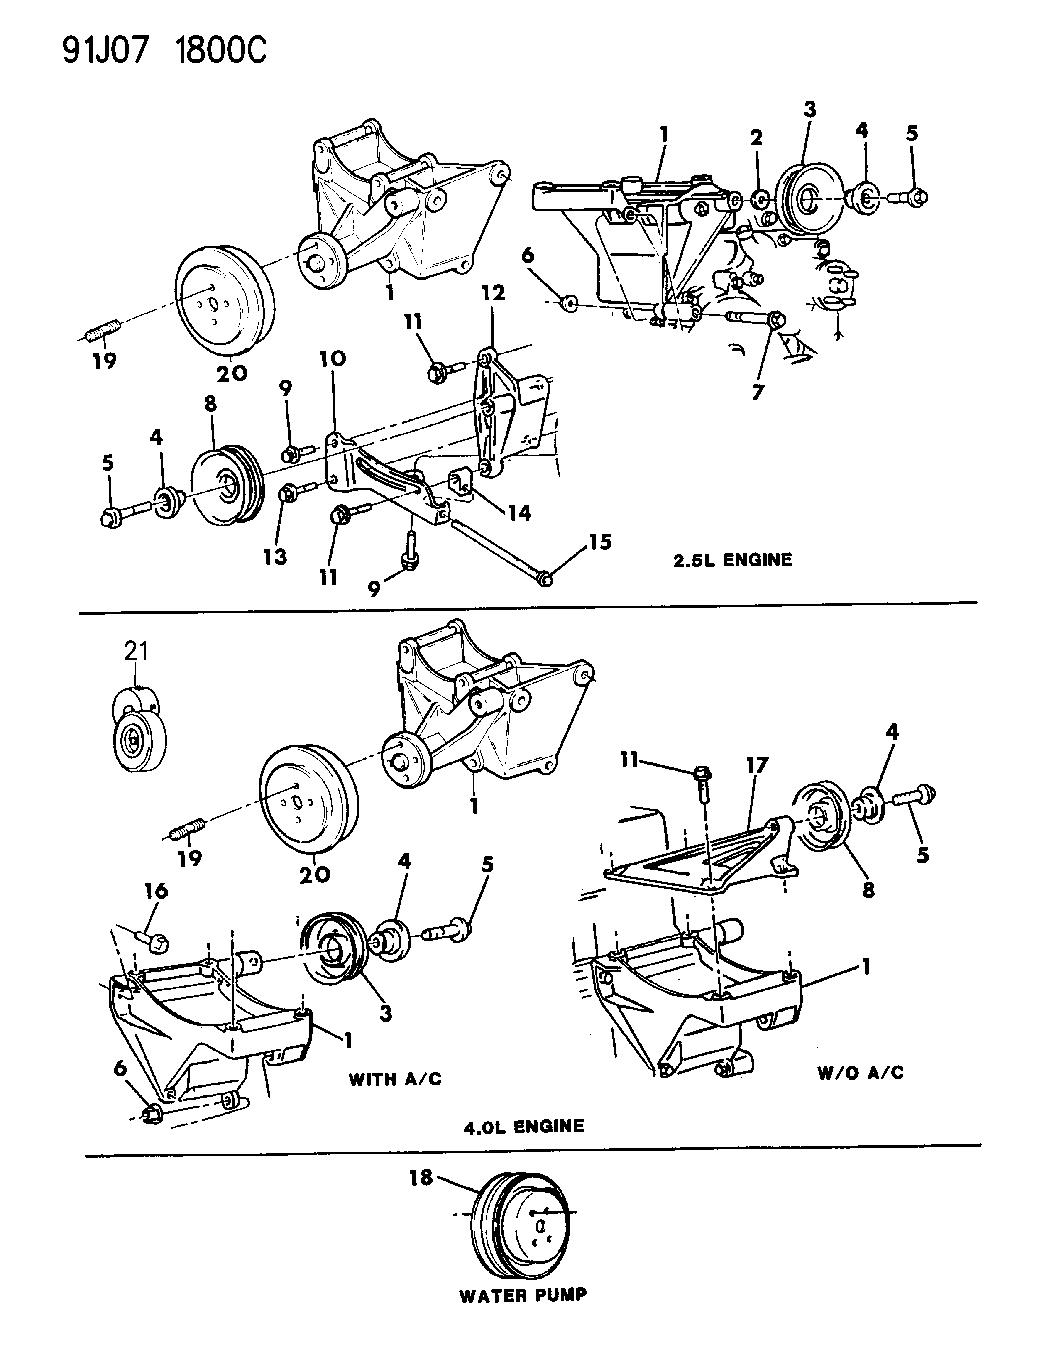 DIAGRAM] 92 4 0 Jeep Pulley Diagram FULL Version HD Quality Pulley Diagram  - DIAGRAMPASSABLE.UNICEFFLAUBERT.FRUnicef Flaubert